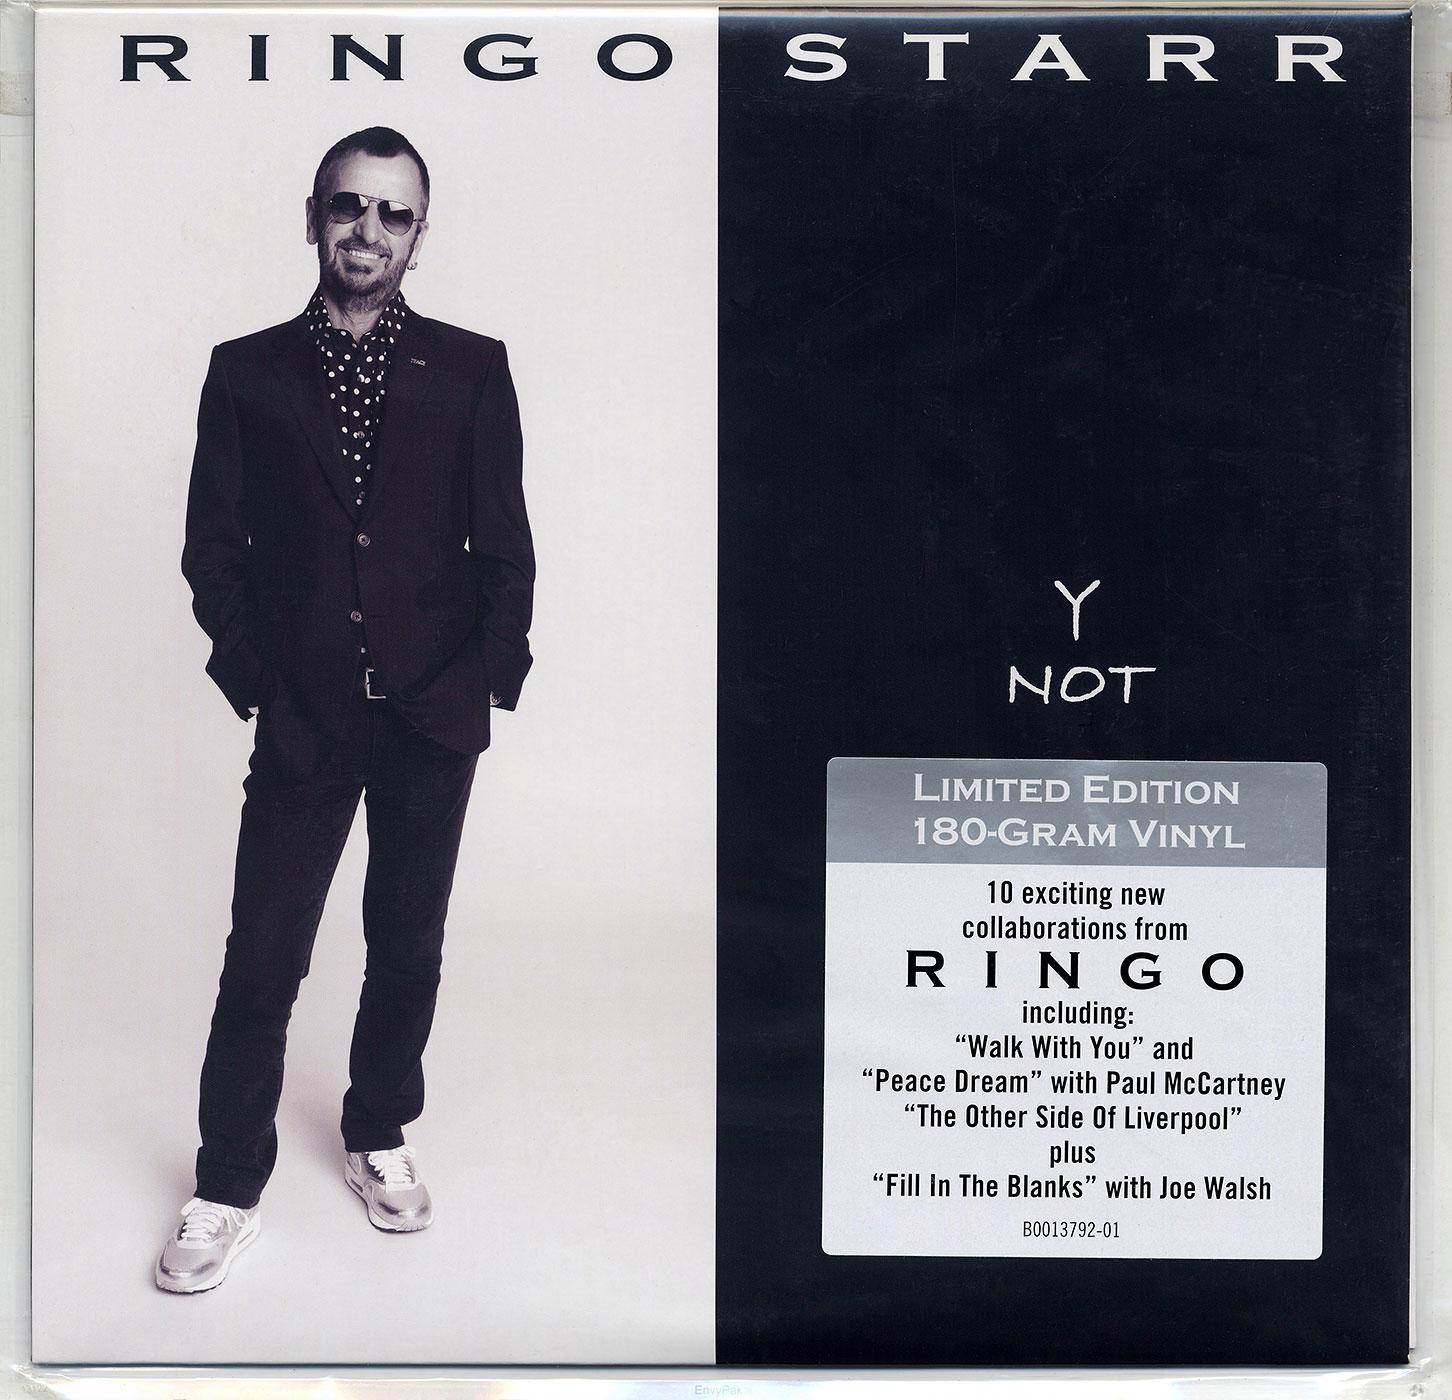 Ringo Starr - Y NOT (Hip-O Records B0013792-